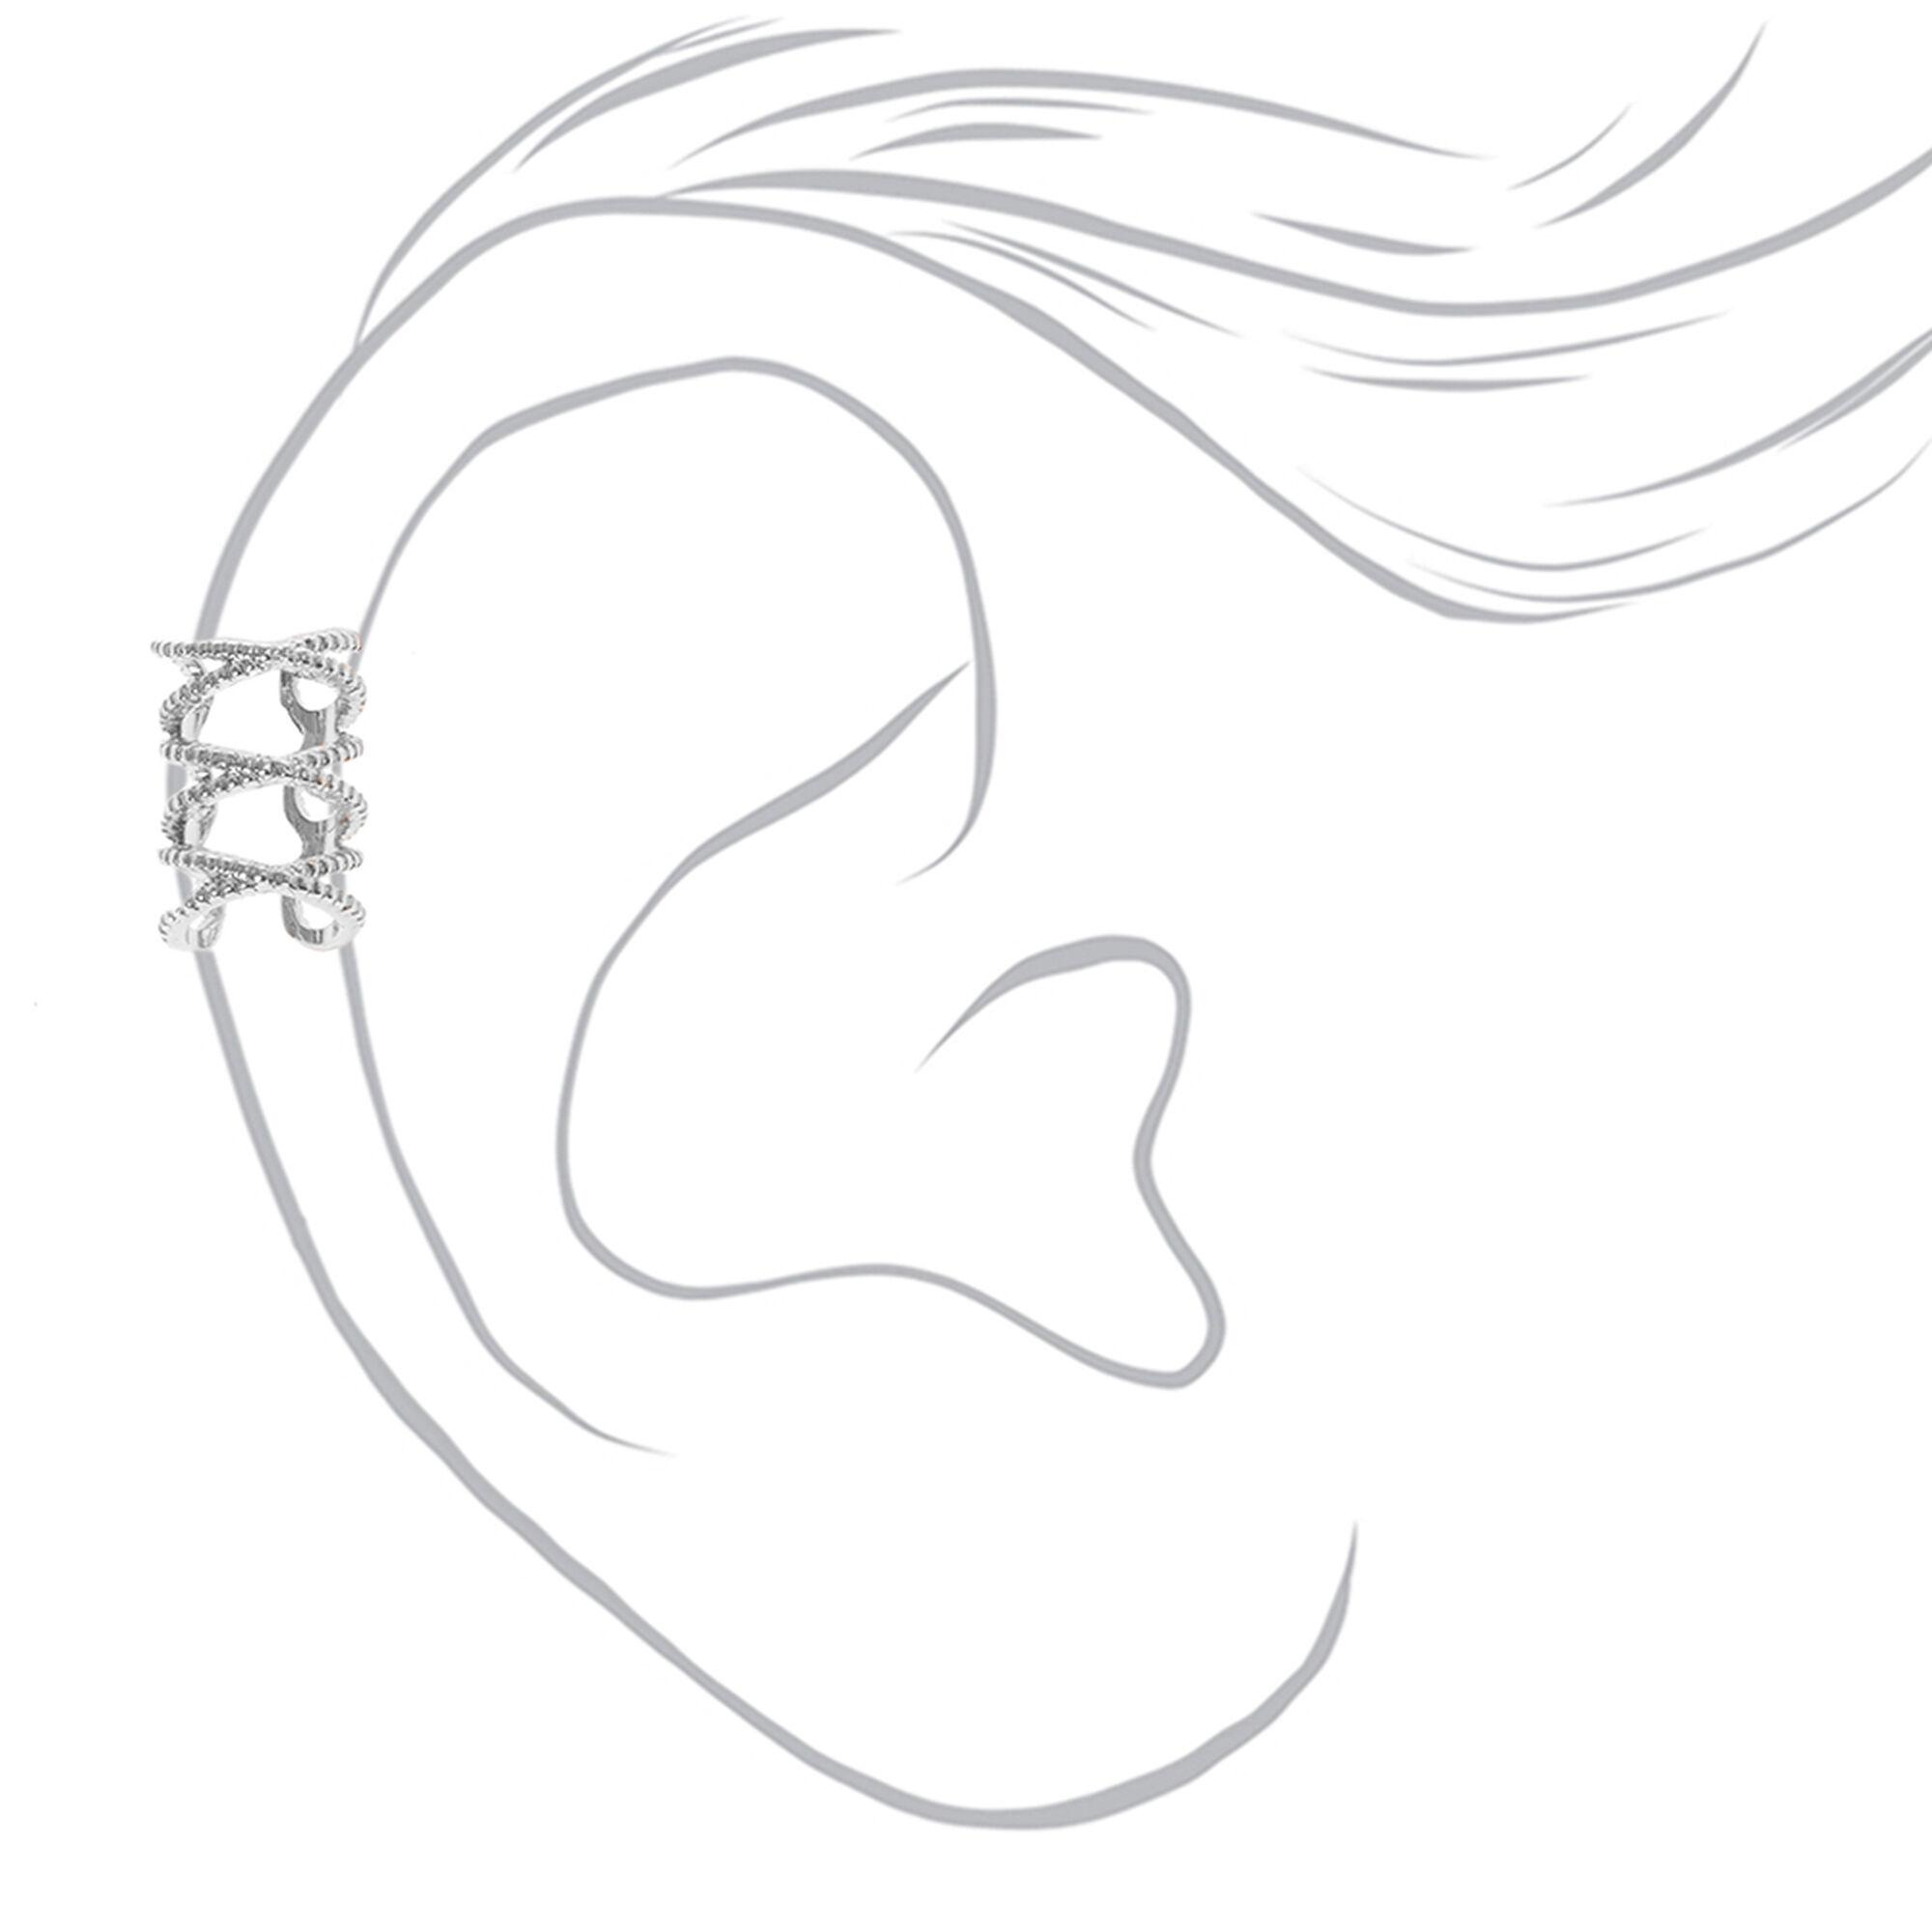 Silver Tone Triple Infinity Symbol Ear Cuff Icing Us